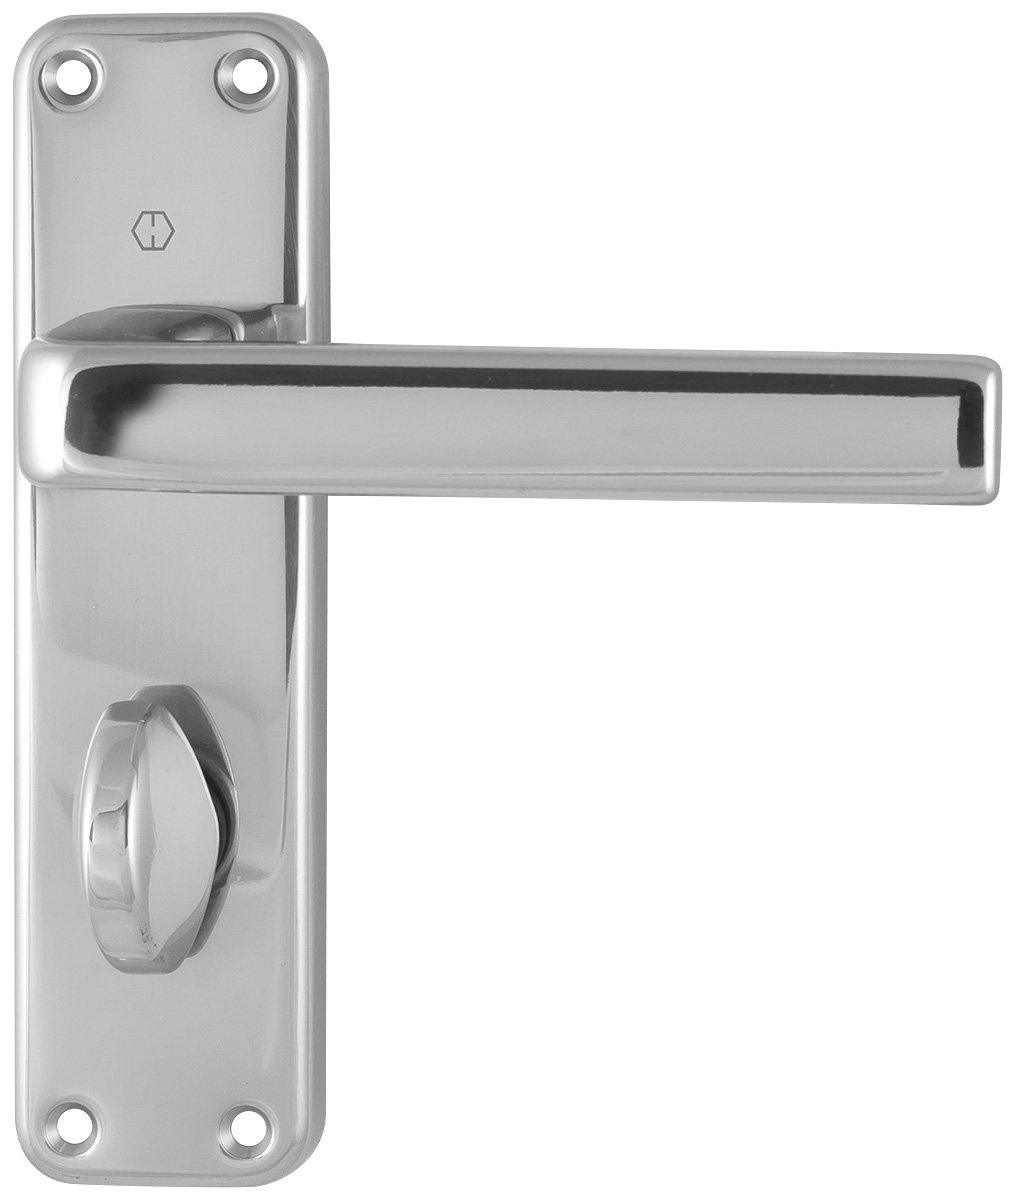 Sensational Hoppe Dublin 1124 267 87142490 Bathroom Privacy Lever Interior Design Ideas Ghosoteloinfo